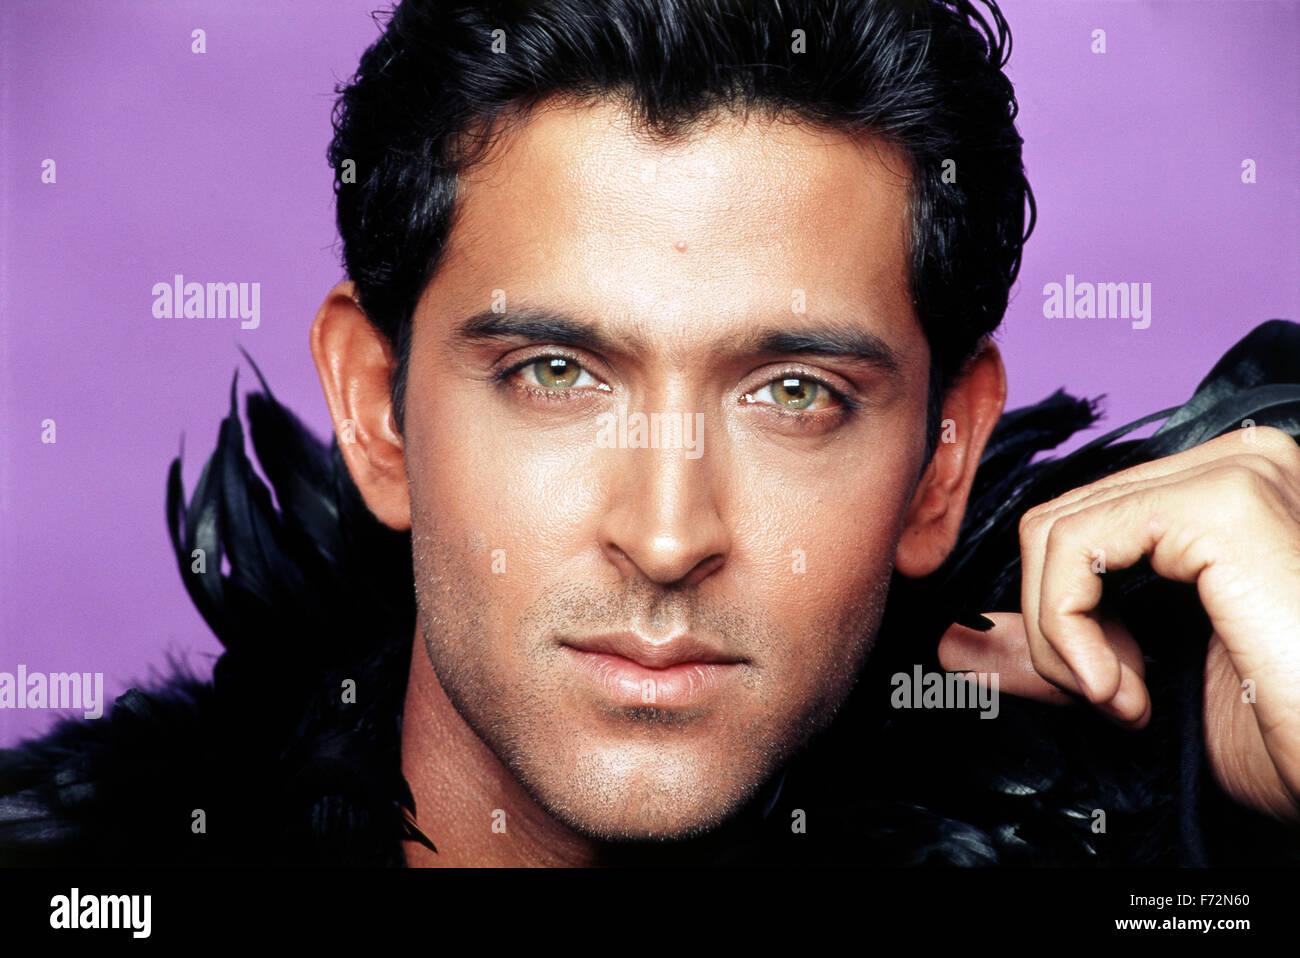 Indian Film Actor Hrithik Roshan India Asia 2004 Stock Photo